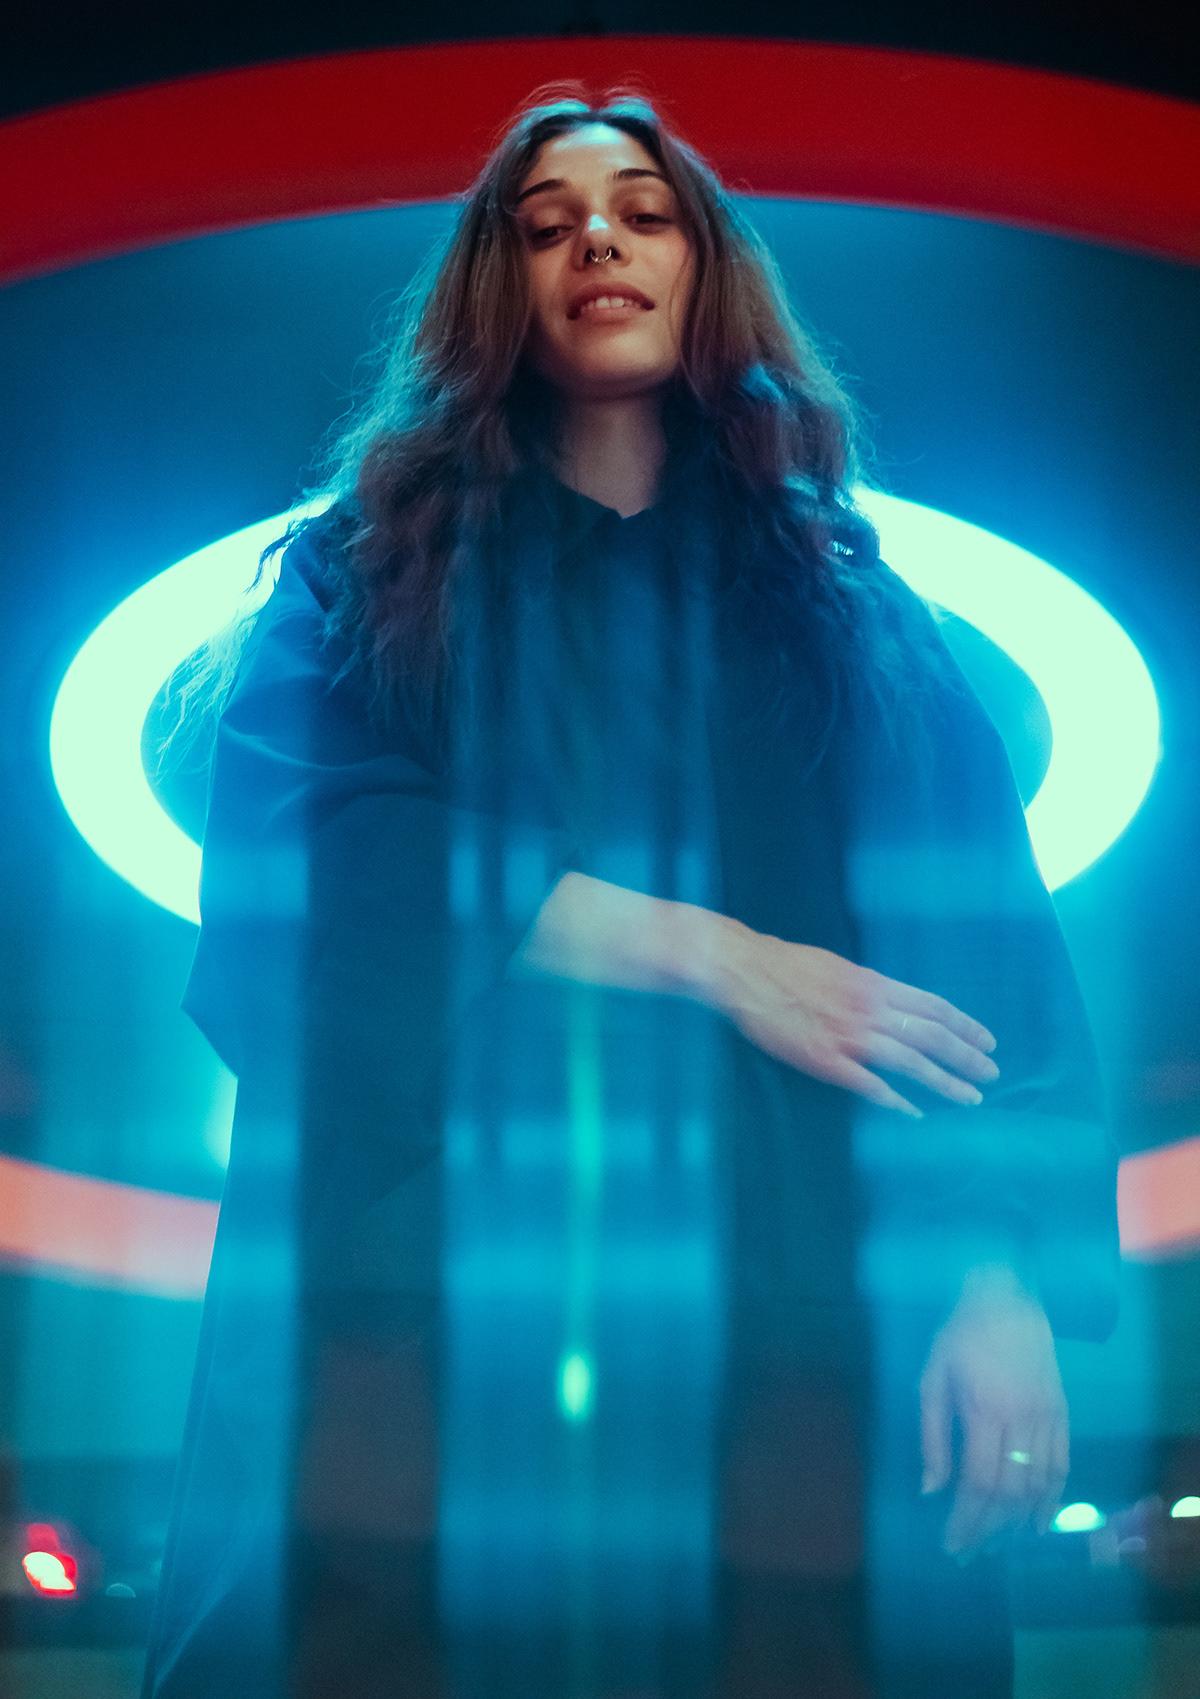 Adobe Portfolio dj music musician portrait neon techno